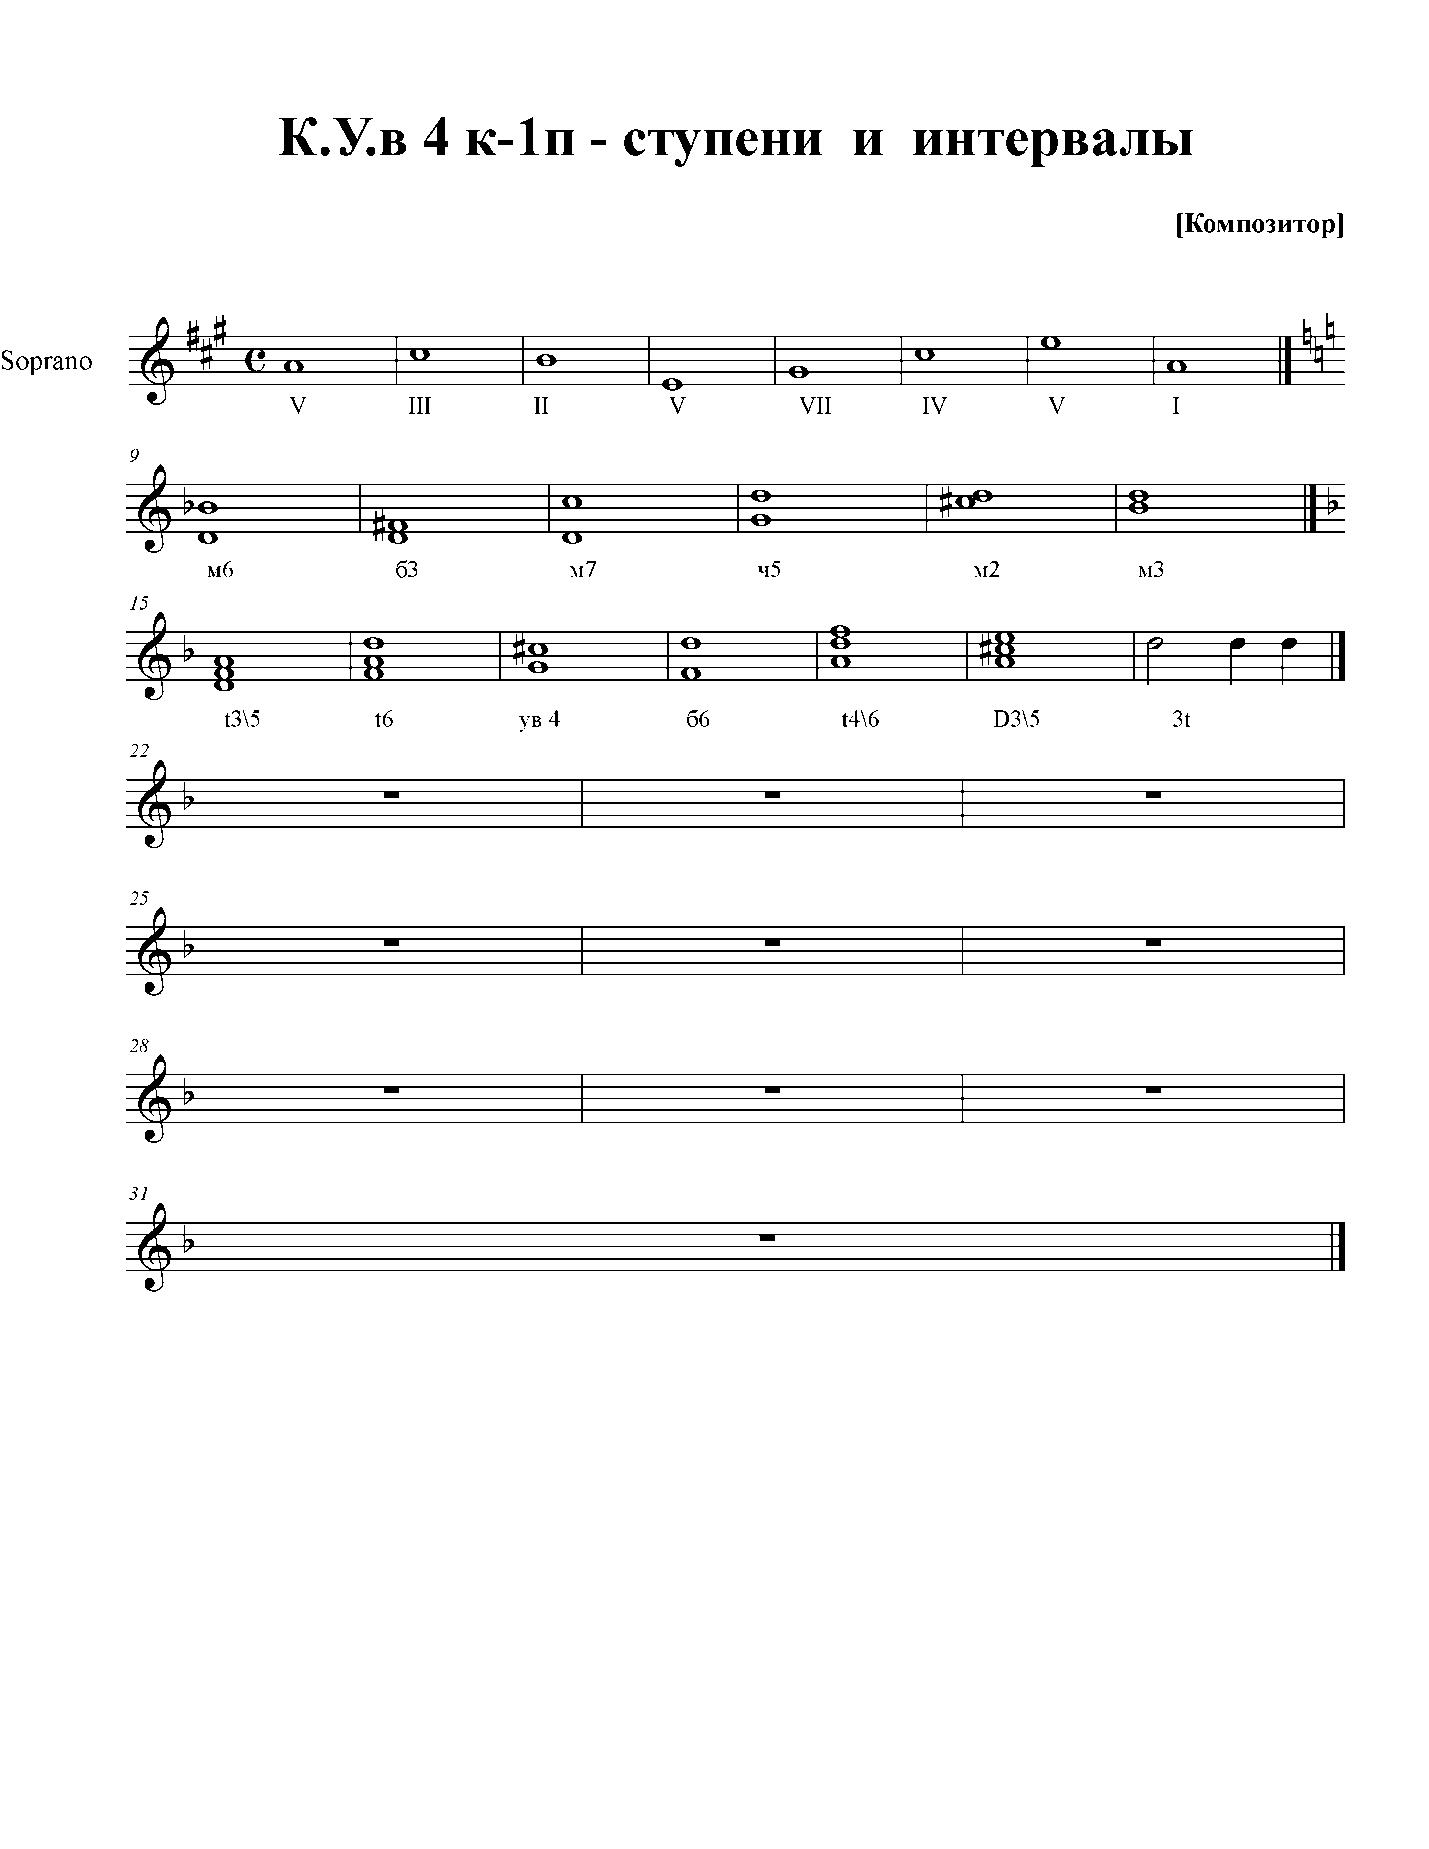 К.у. 4 кл -1п-ступе-интервалы-аккорды.TIF